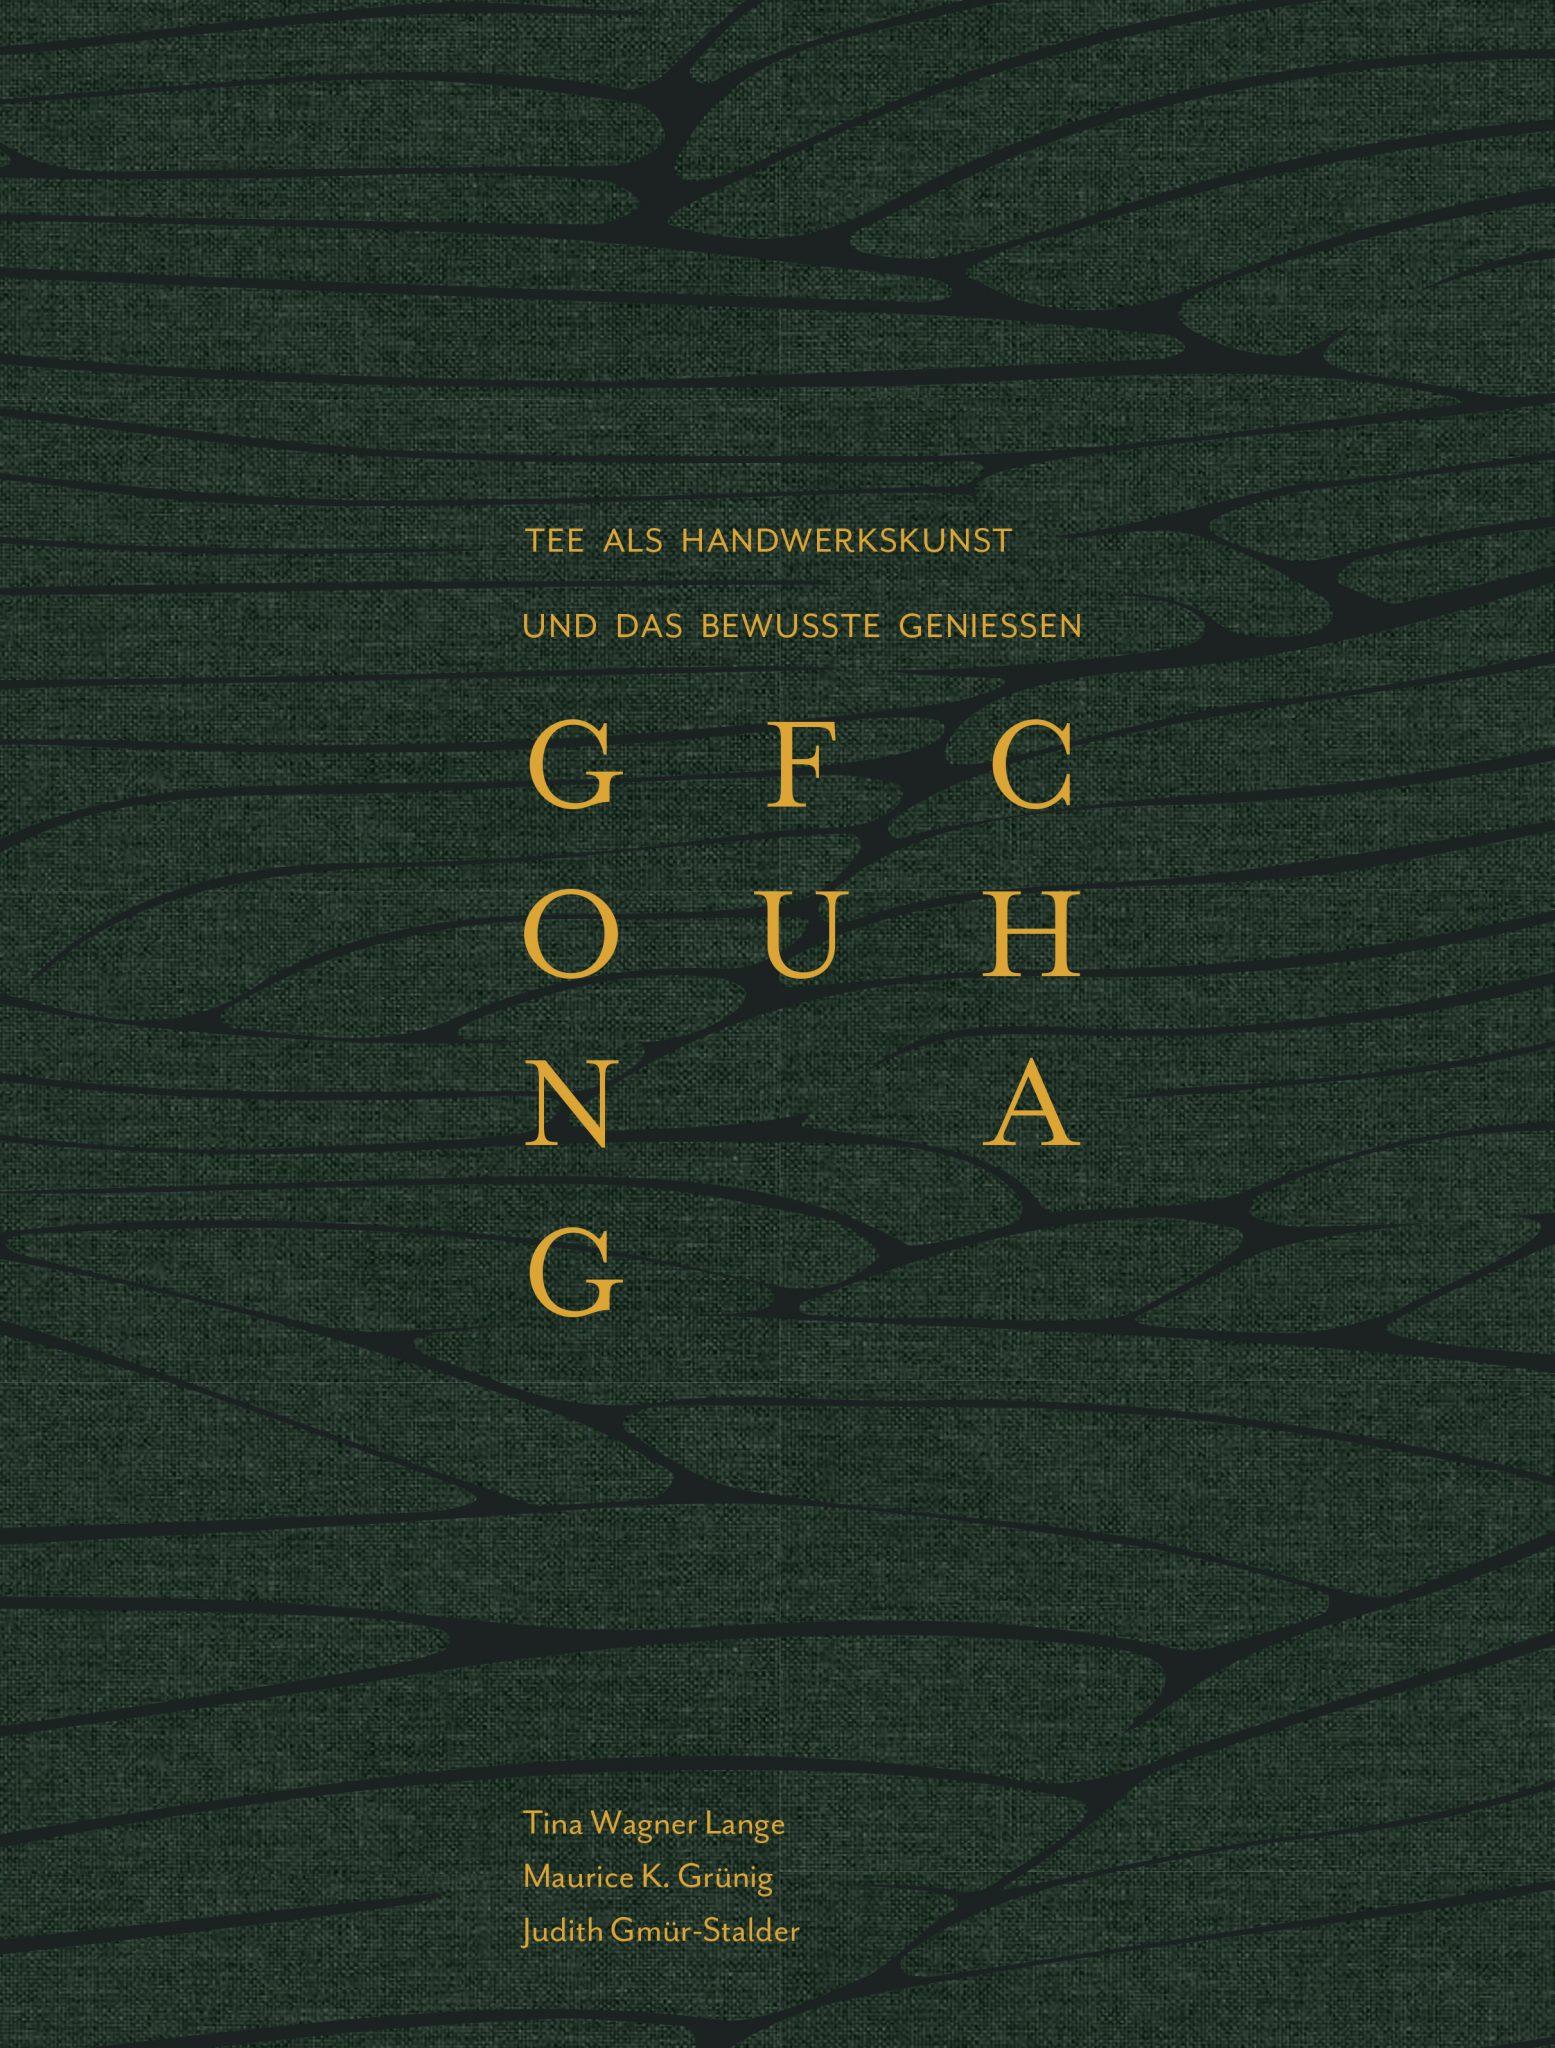 Gong Fu Cha_Teebuch. 2019 AT Verlag